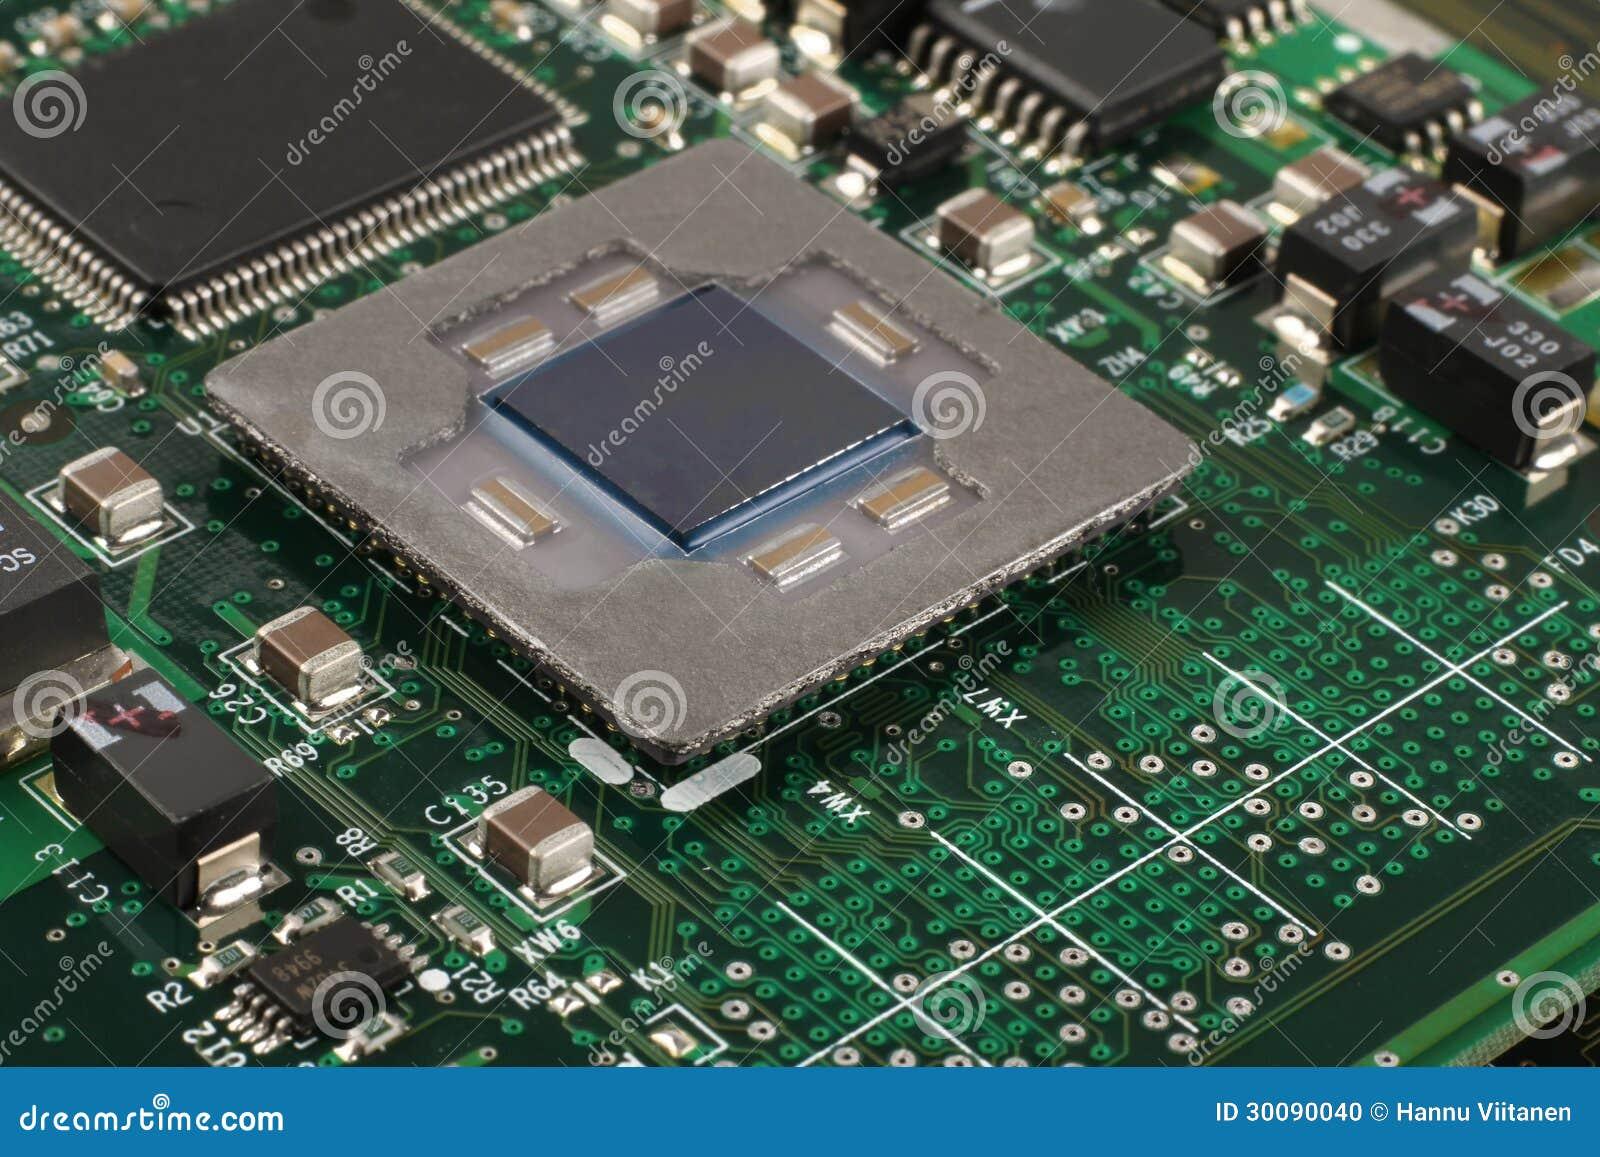 Computer Microprocessor Closeup Stock Photo - Image: 30090040